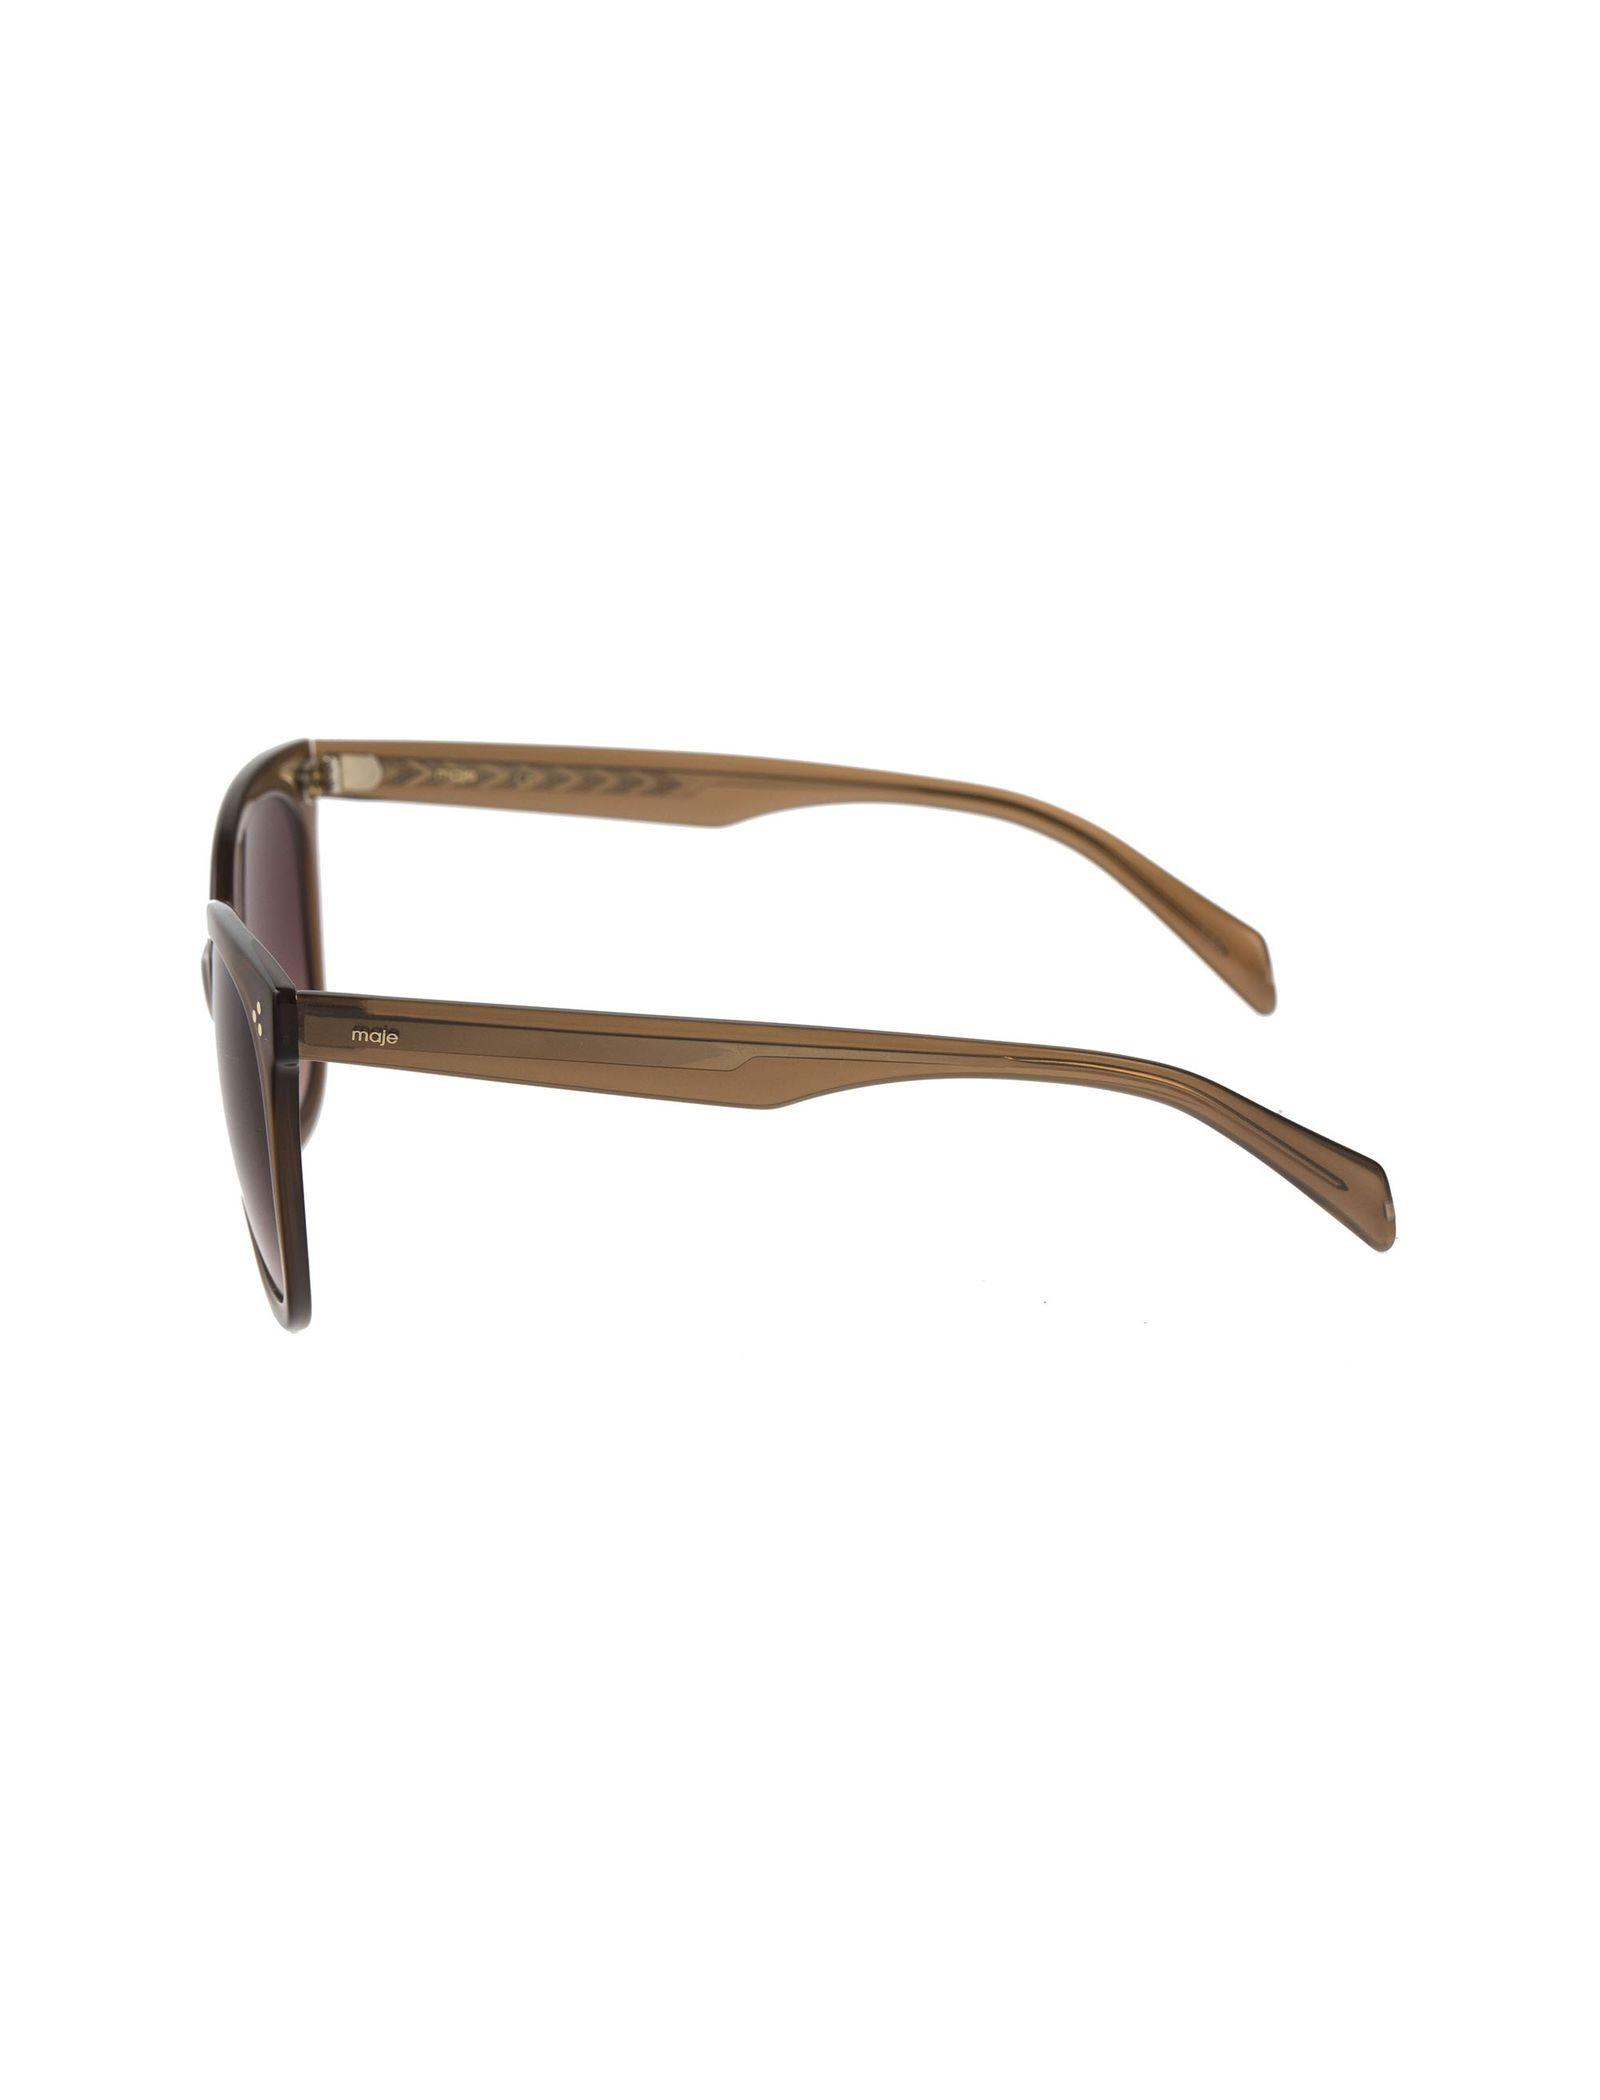 عینک آفتابی ویفرر زنانه - ماژ - قهوه اي - 3